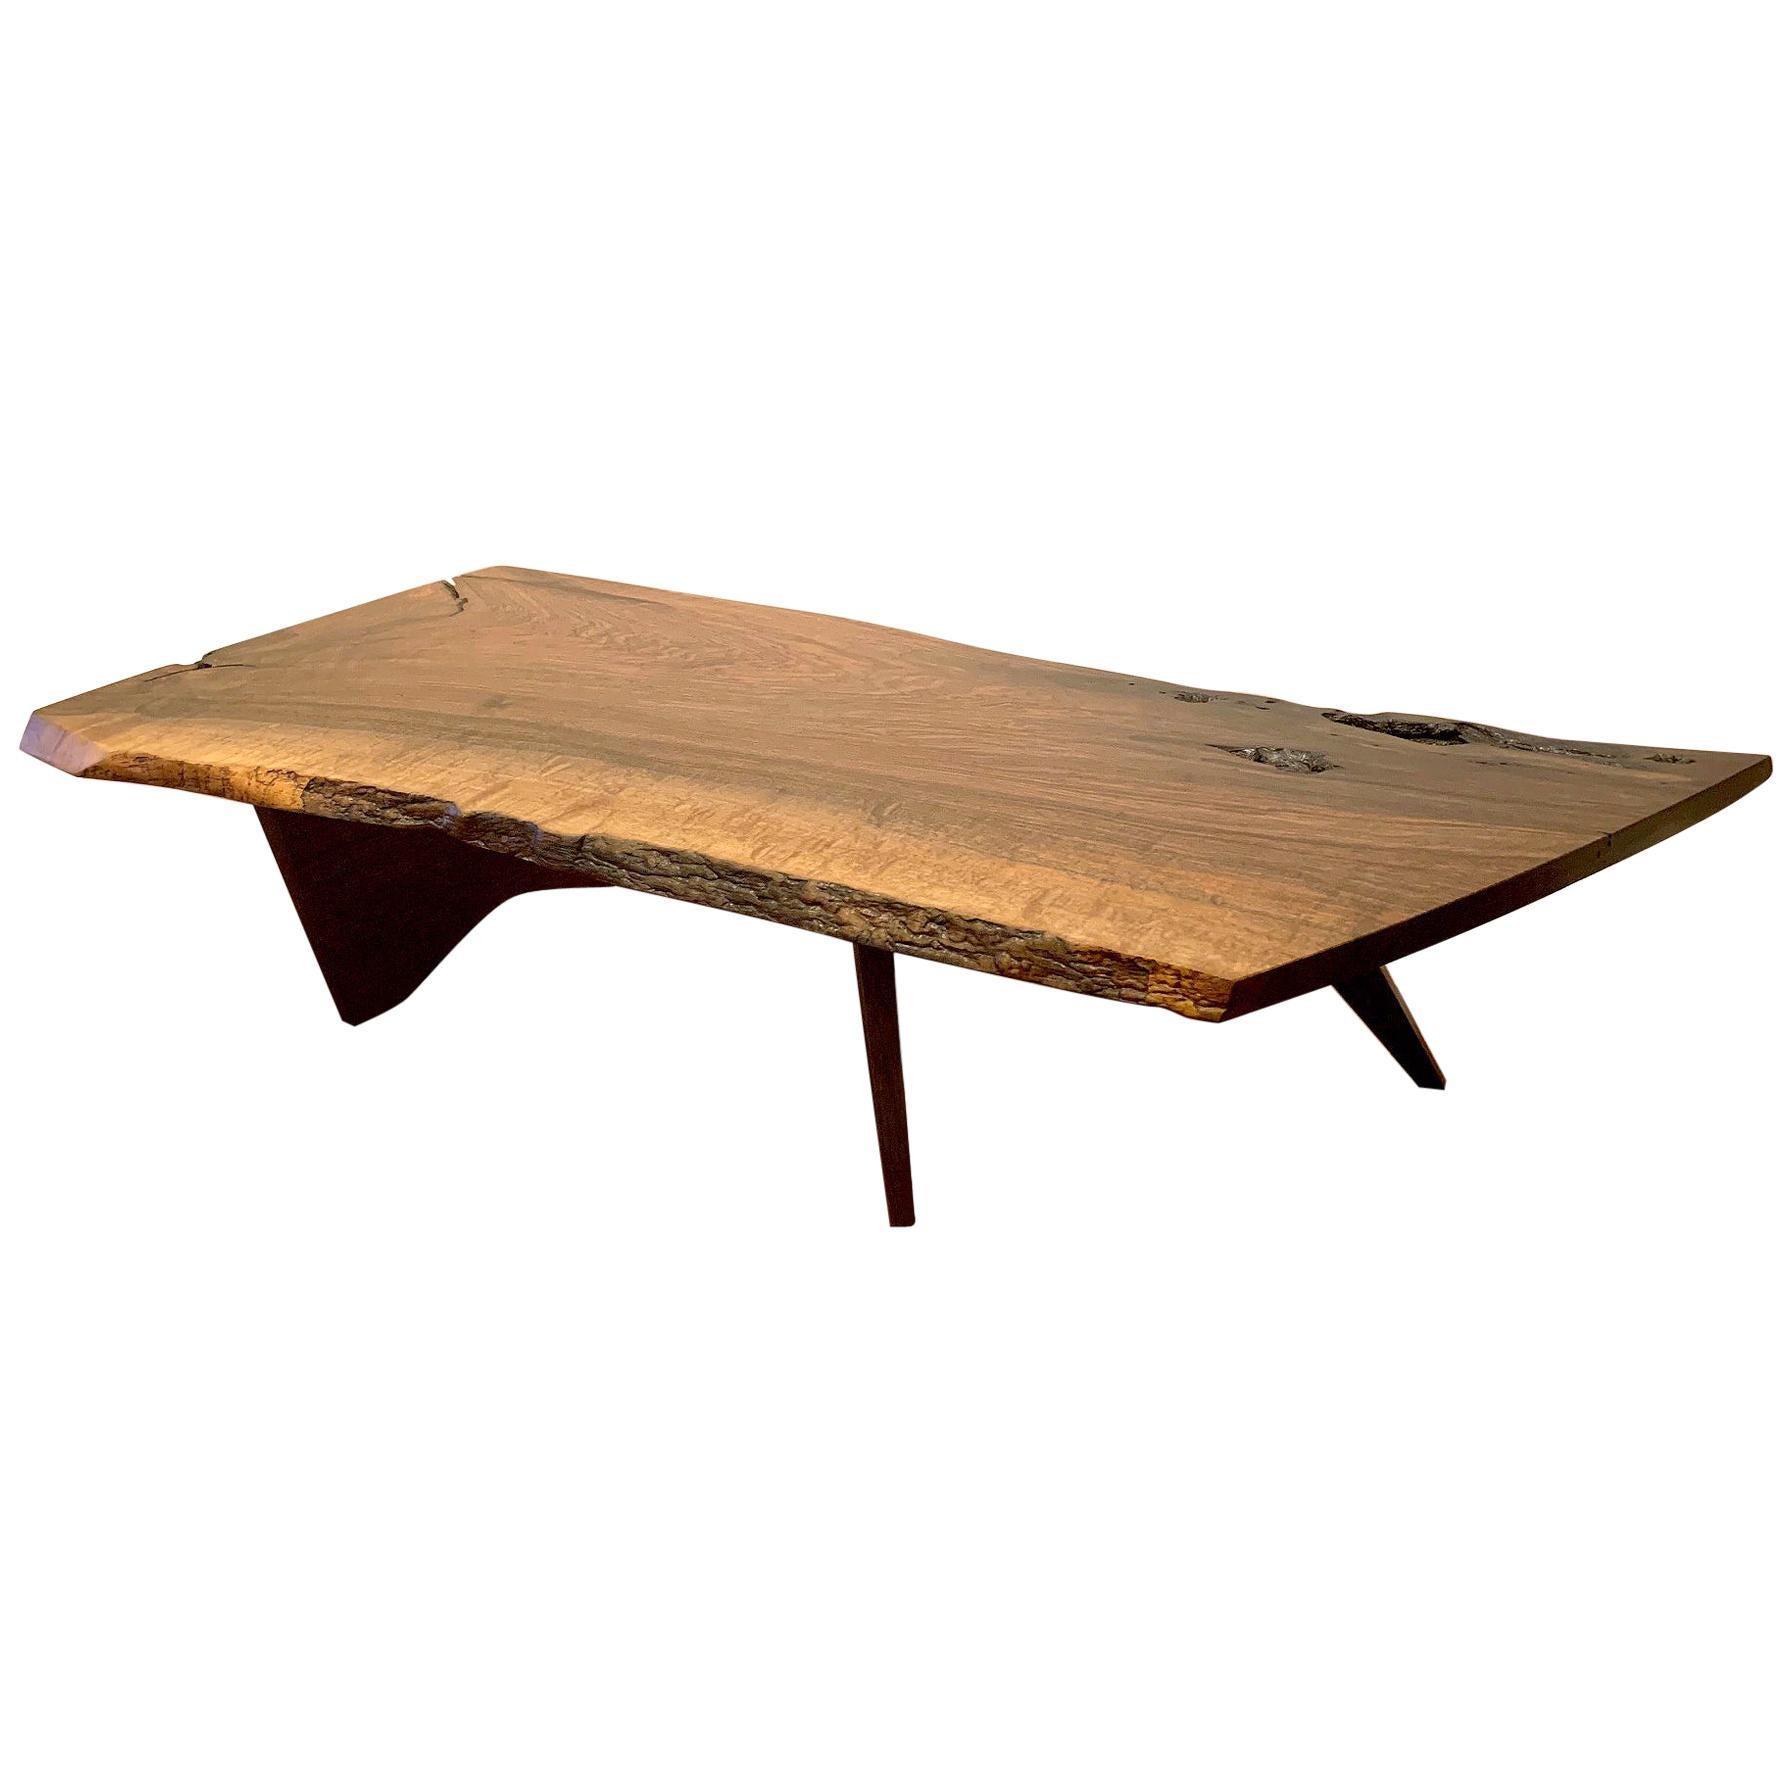 Early Slab Walnut Coffee Table George Nakashima